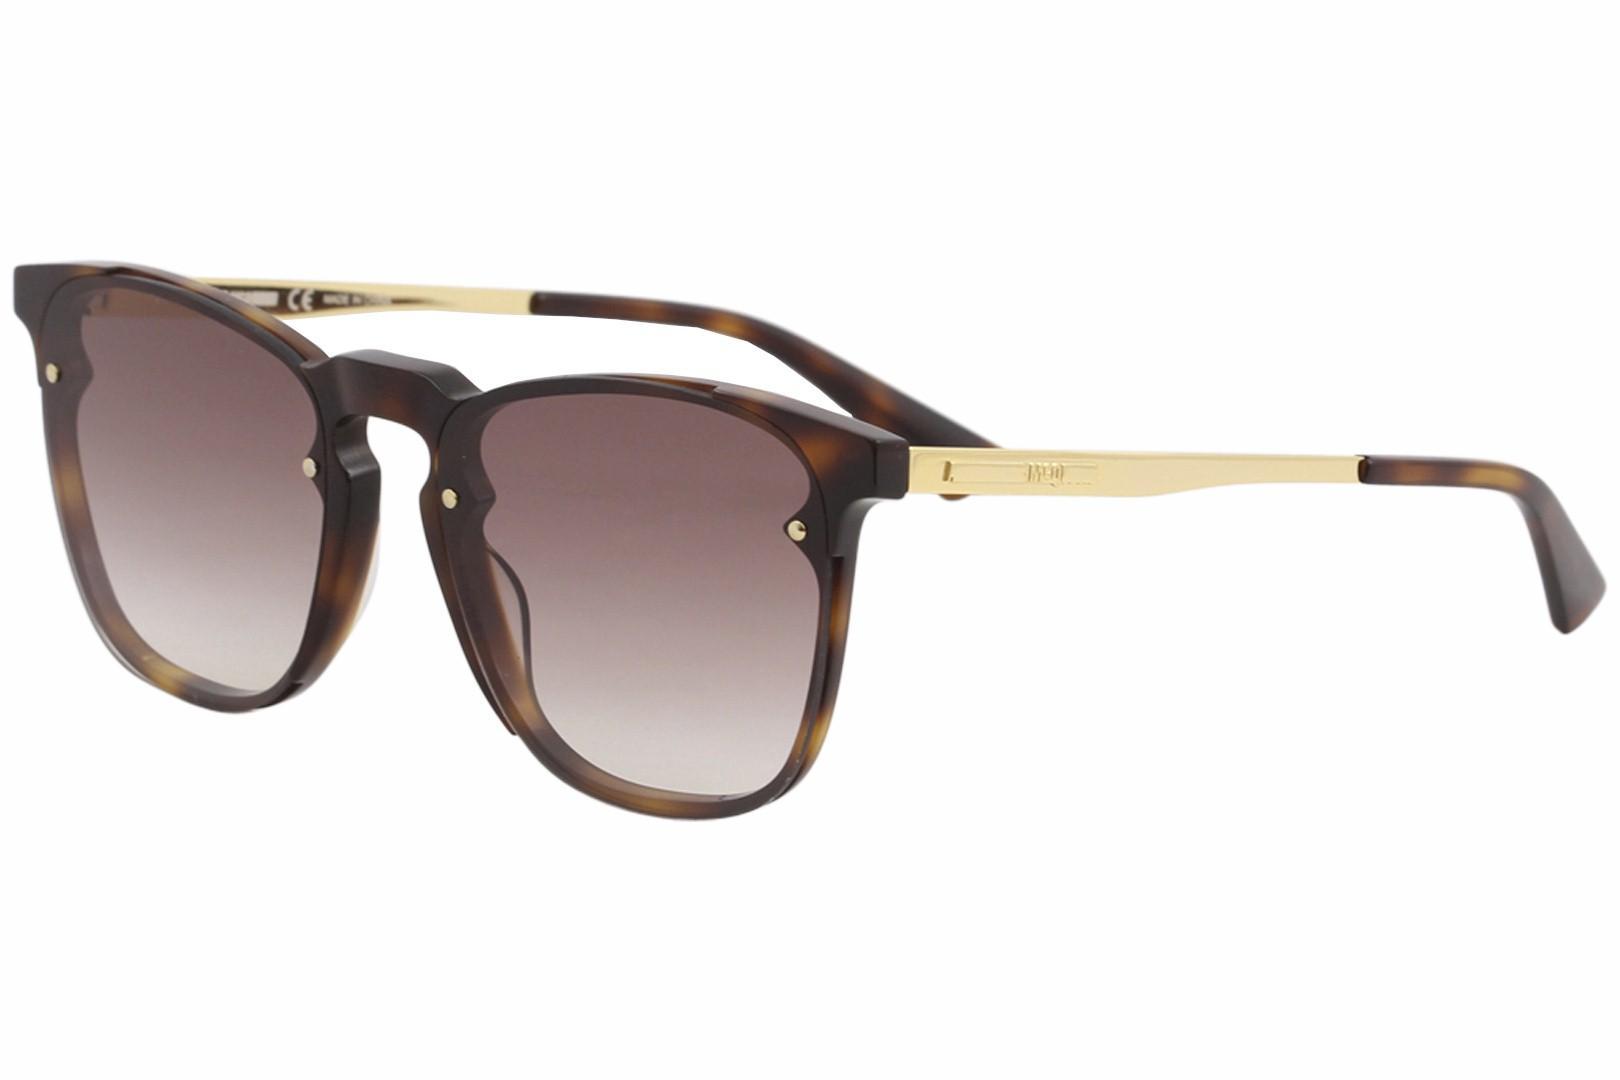 Image of McQ By Alexander McQueen Iconic MQ0134S M/0134/S 002 Havana Sunglasses 55mm - Havana Gold/Brown Gradient   002 - Lens 55 Bridge 18 Temple 145mm